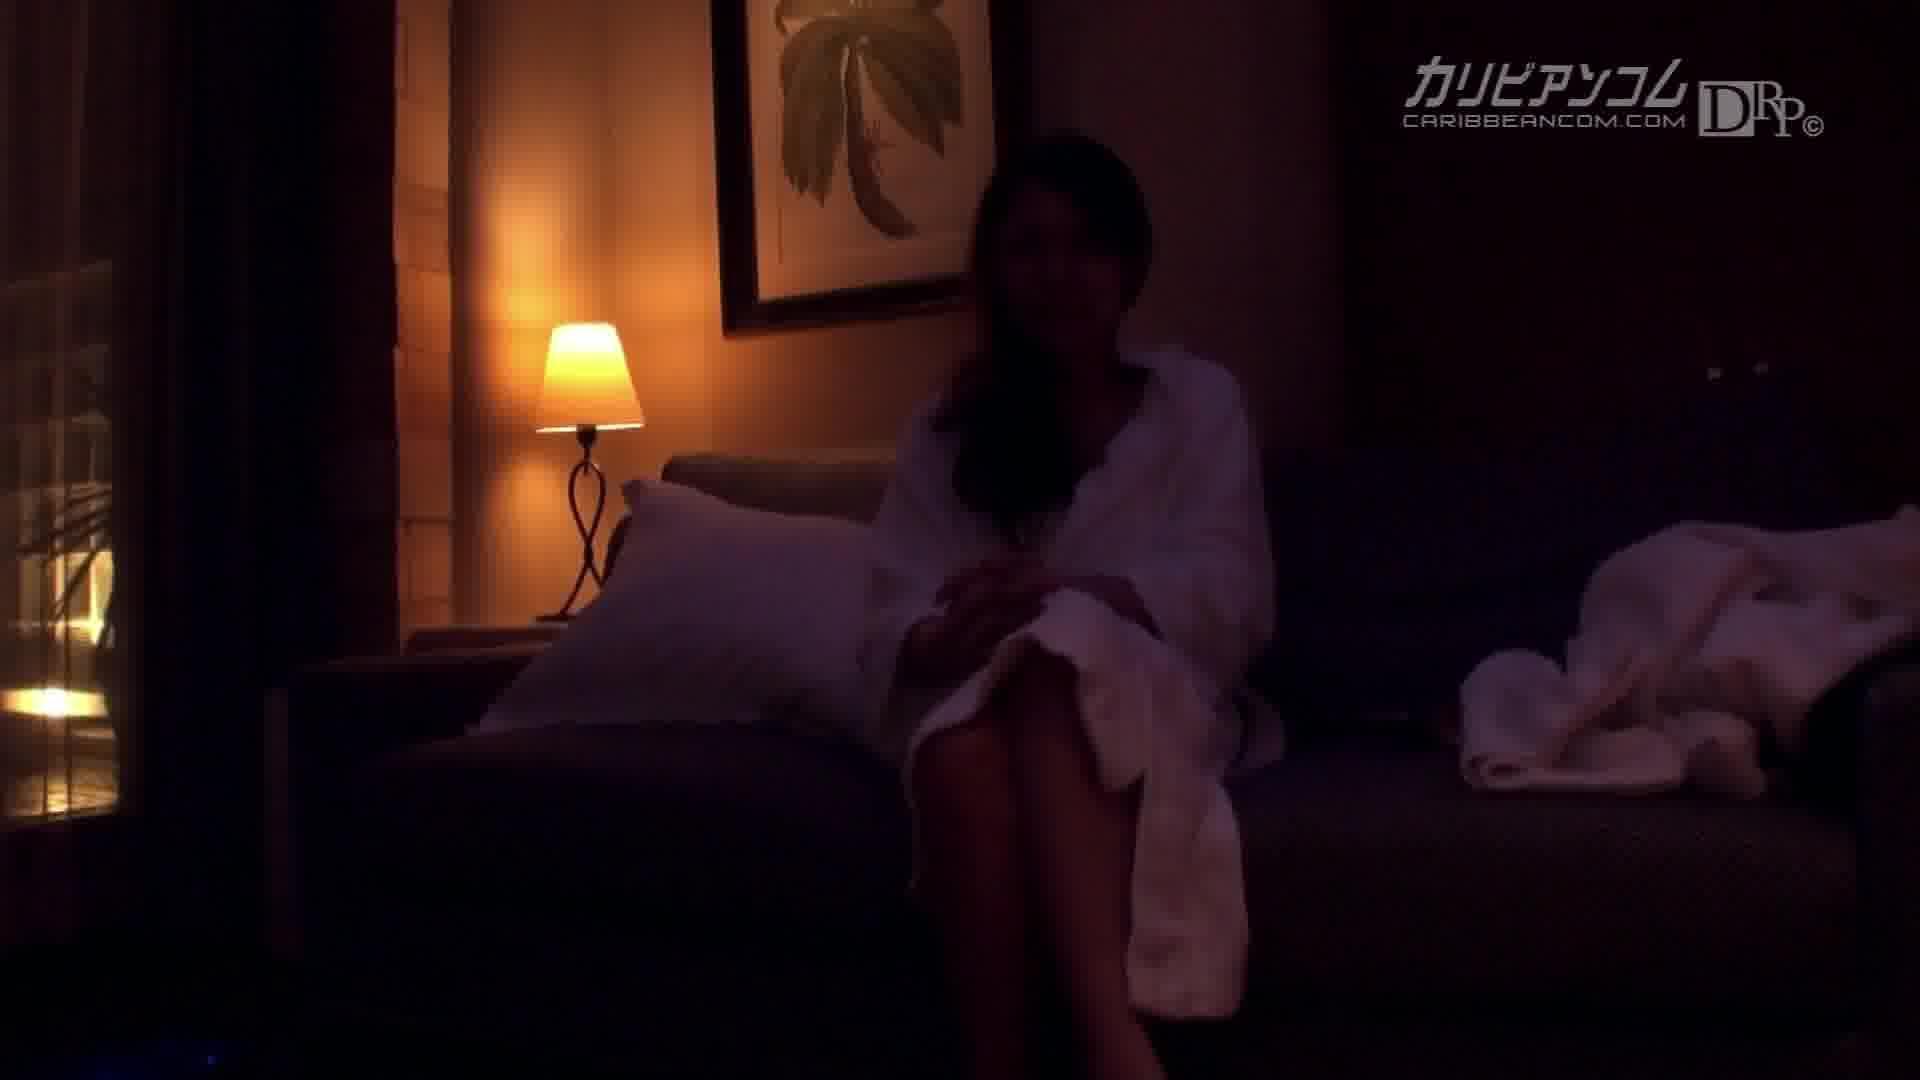 AV女優と飲み…そして泊まりSEX by HAMAR 4 後編 - 甲斐ミハル【巨乳・ドキュメンタリー・中出し】